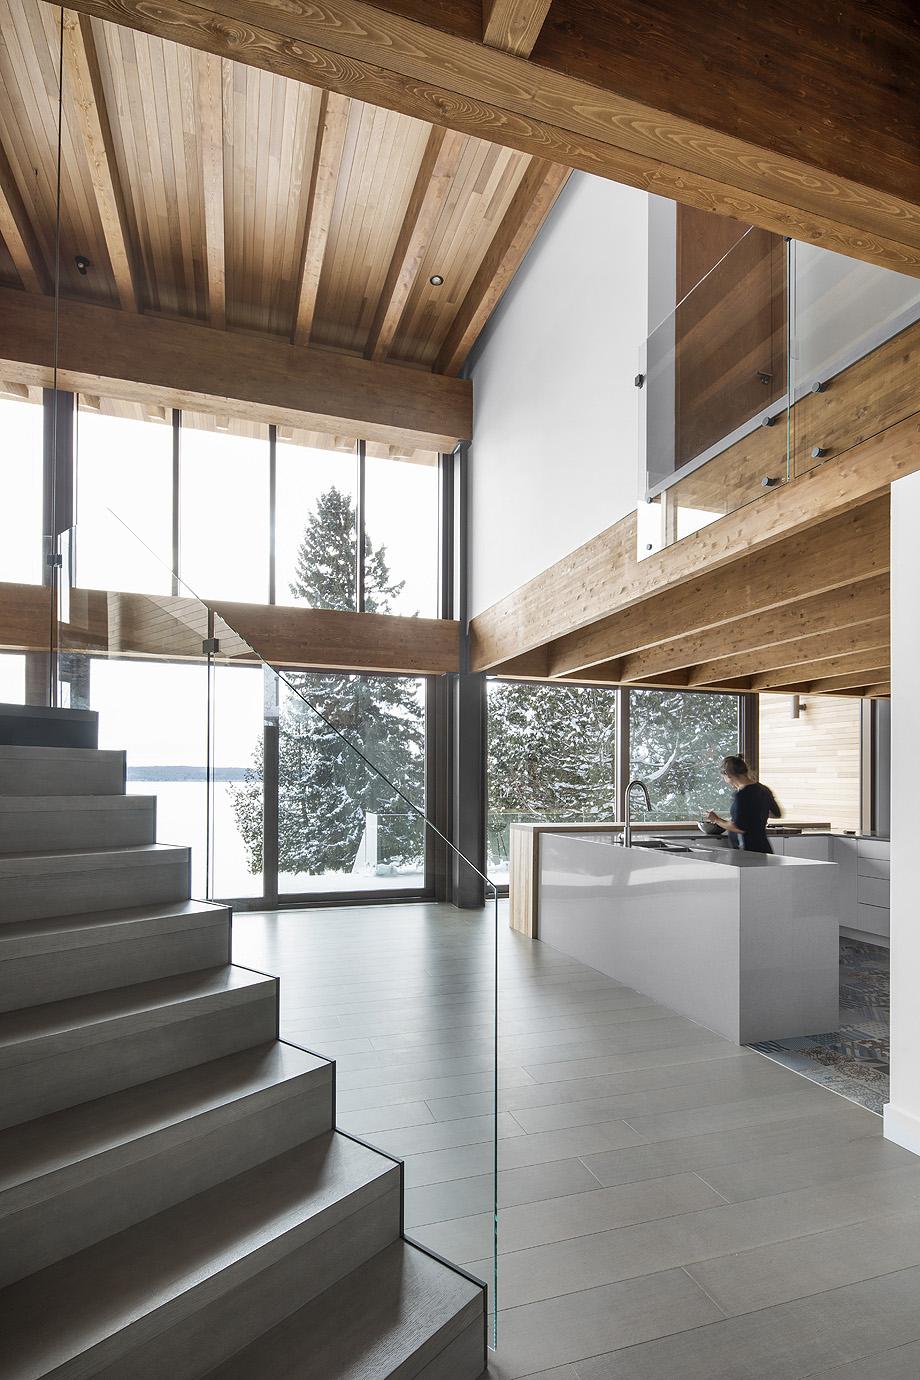 casa accostee de bourgeois lechasseur architects - foto adrien williams (1)